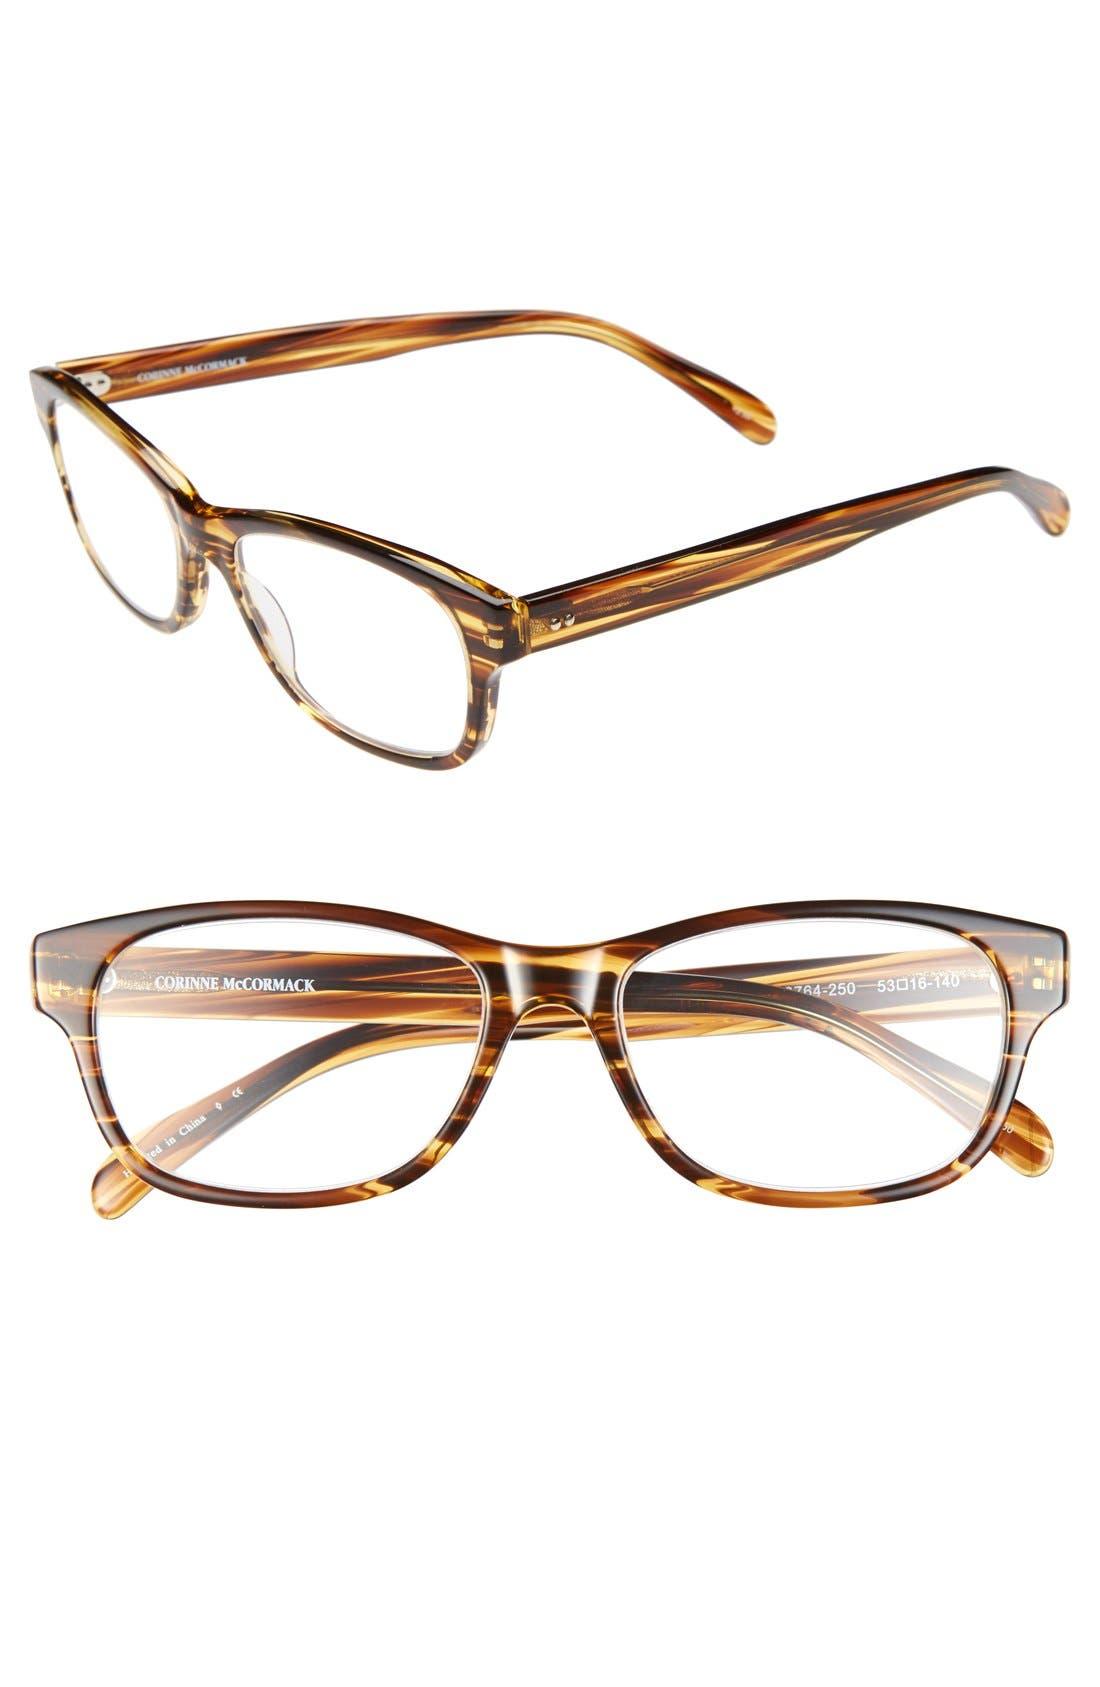 Main Image - Corinne McCormack 'Zooey' 53mm Reading Glasses